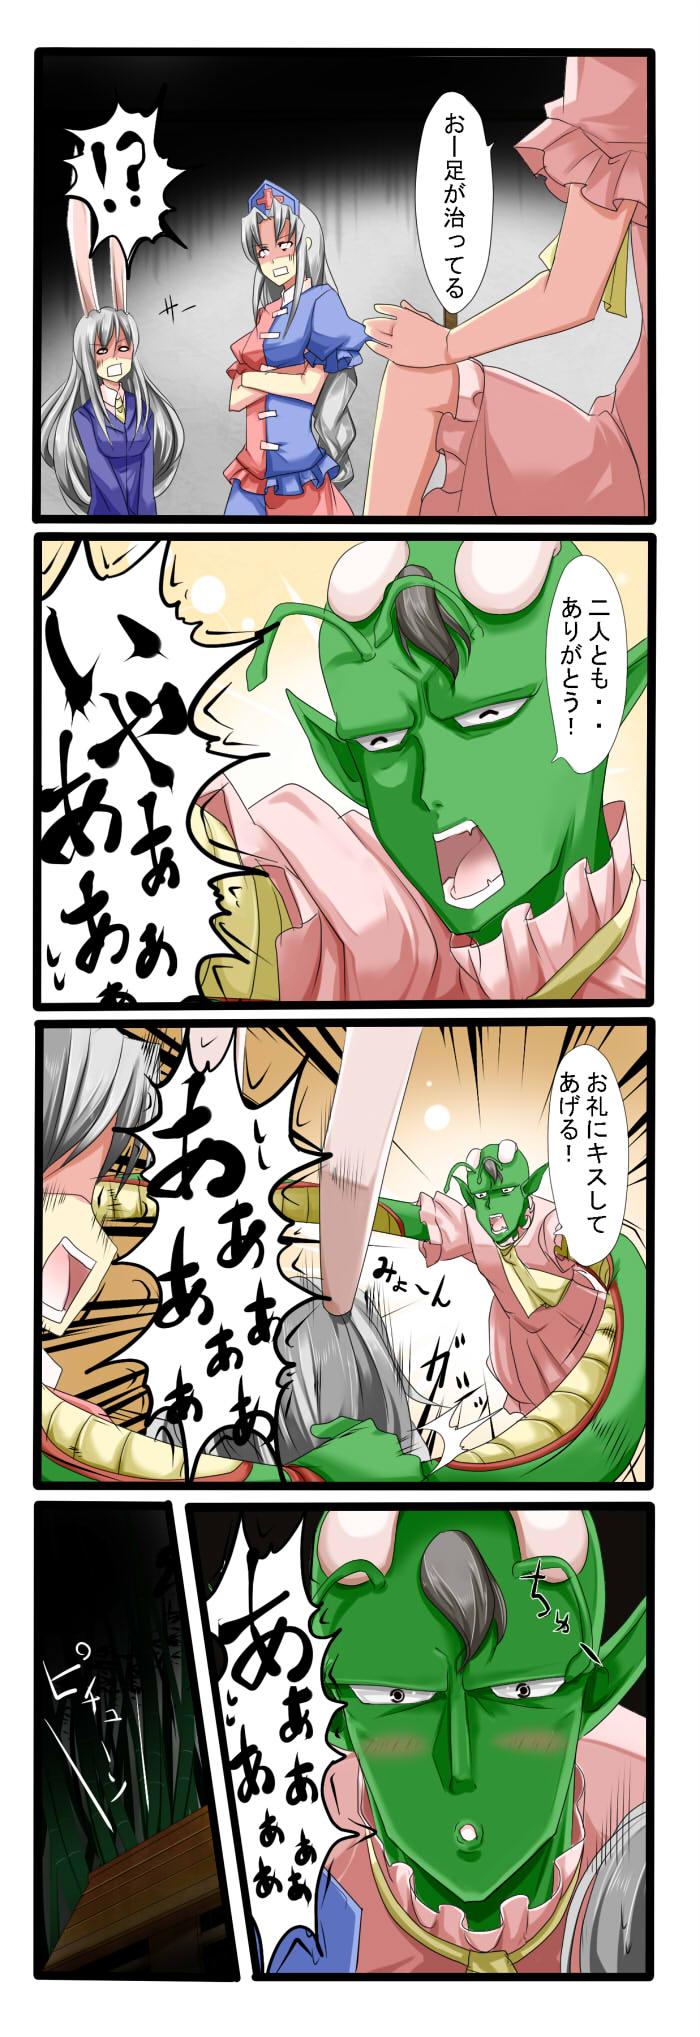 inaba tewi, reisen udongein inaba, and yagokoro eirin (dragon ball z and etc) drawn by tenko (gintenko)